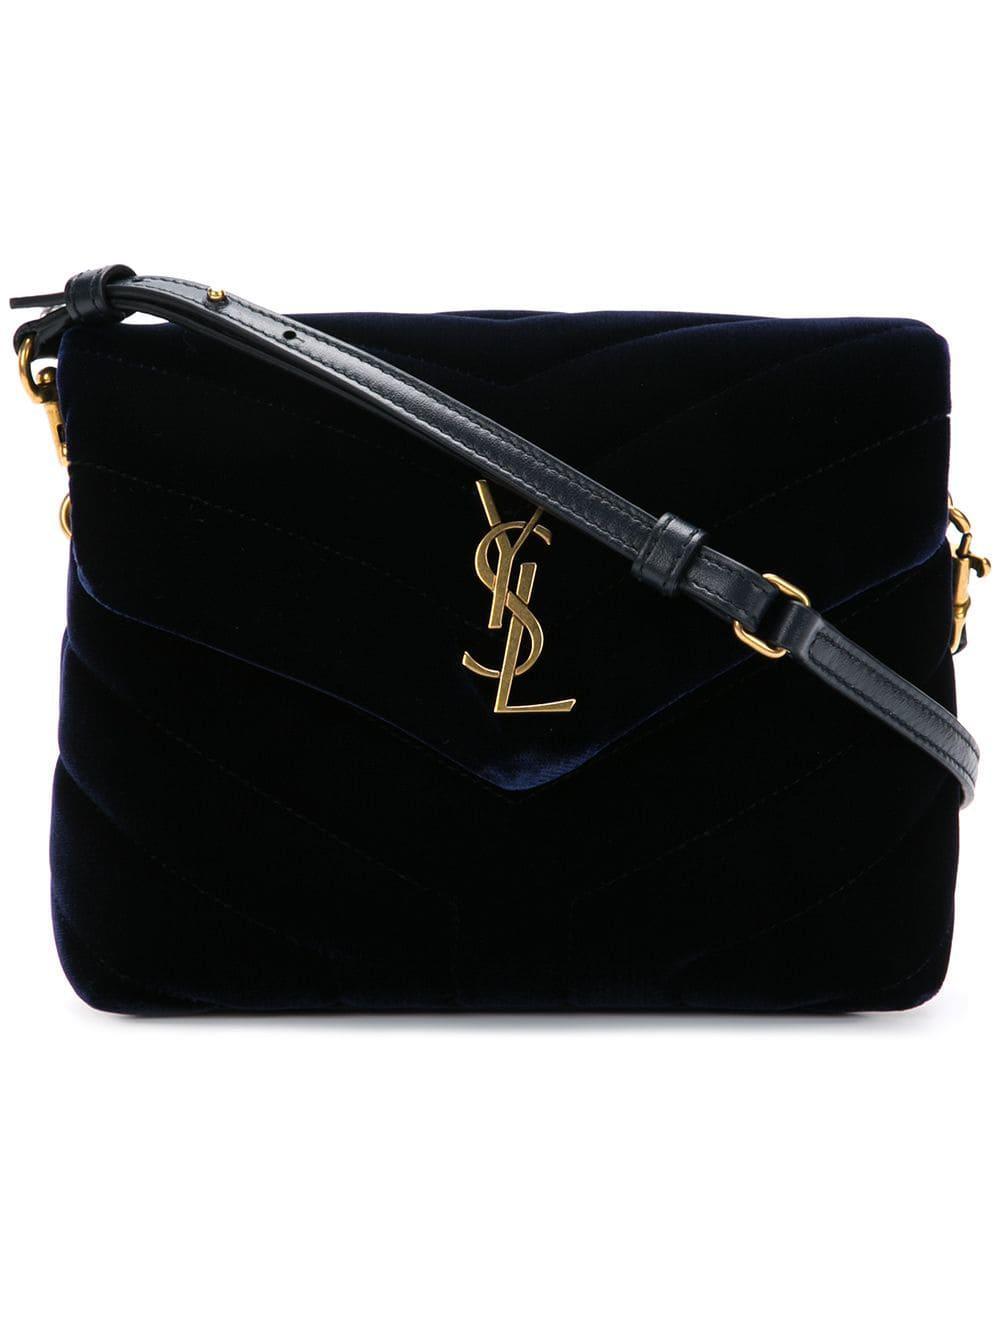 923c6234 Saint Laurent Monogram Leather Shoulder Bag in Blue - Lyst